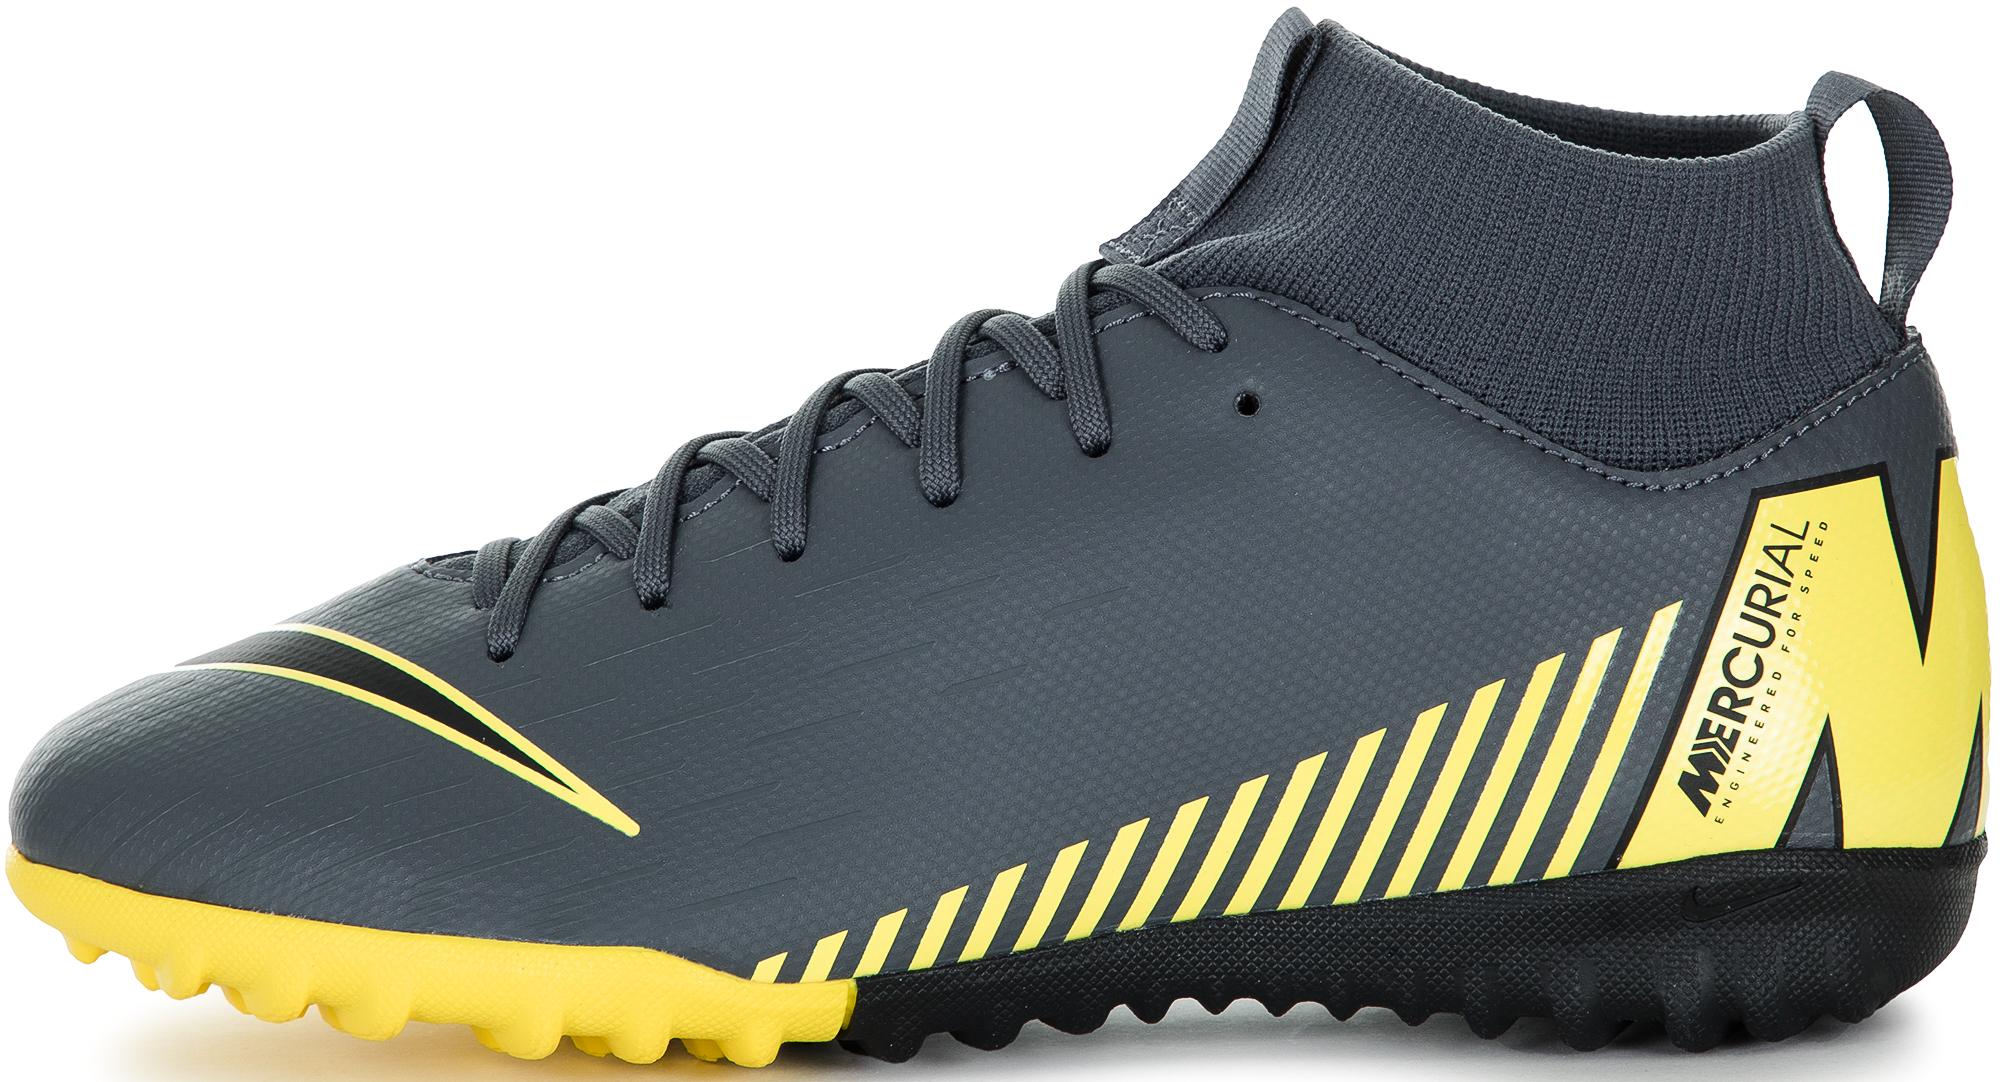 Nike Бутсы для мальчиков Nike Superfly 6 Academy GS TF, размер 37,5